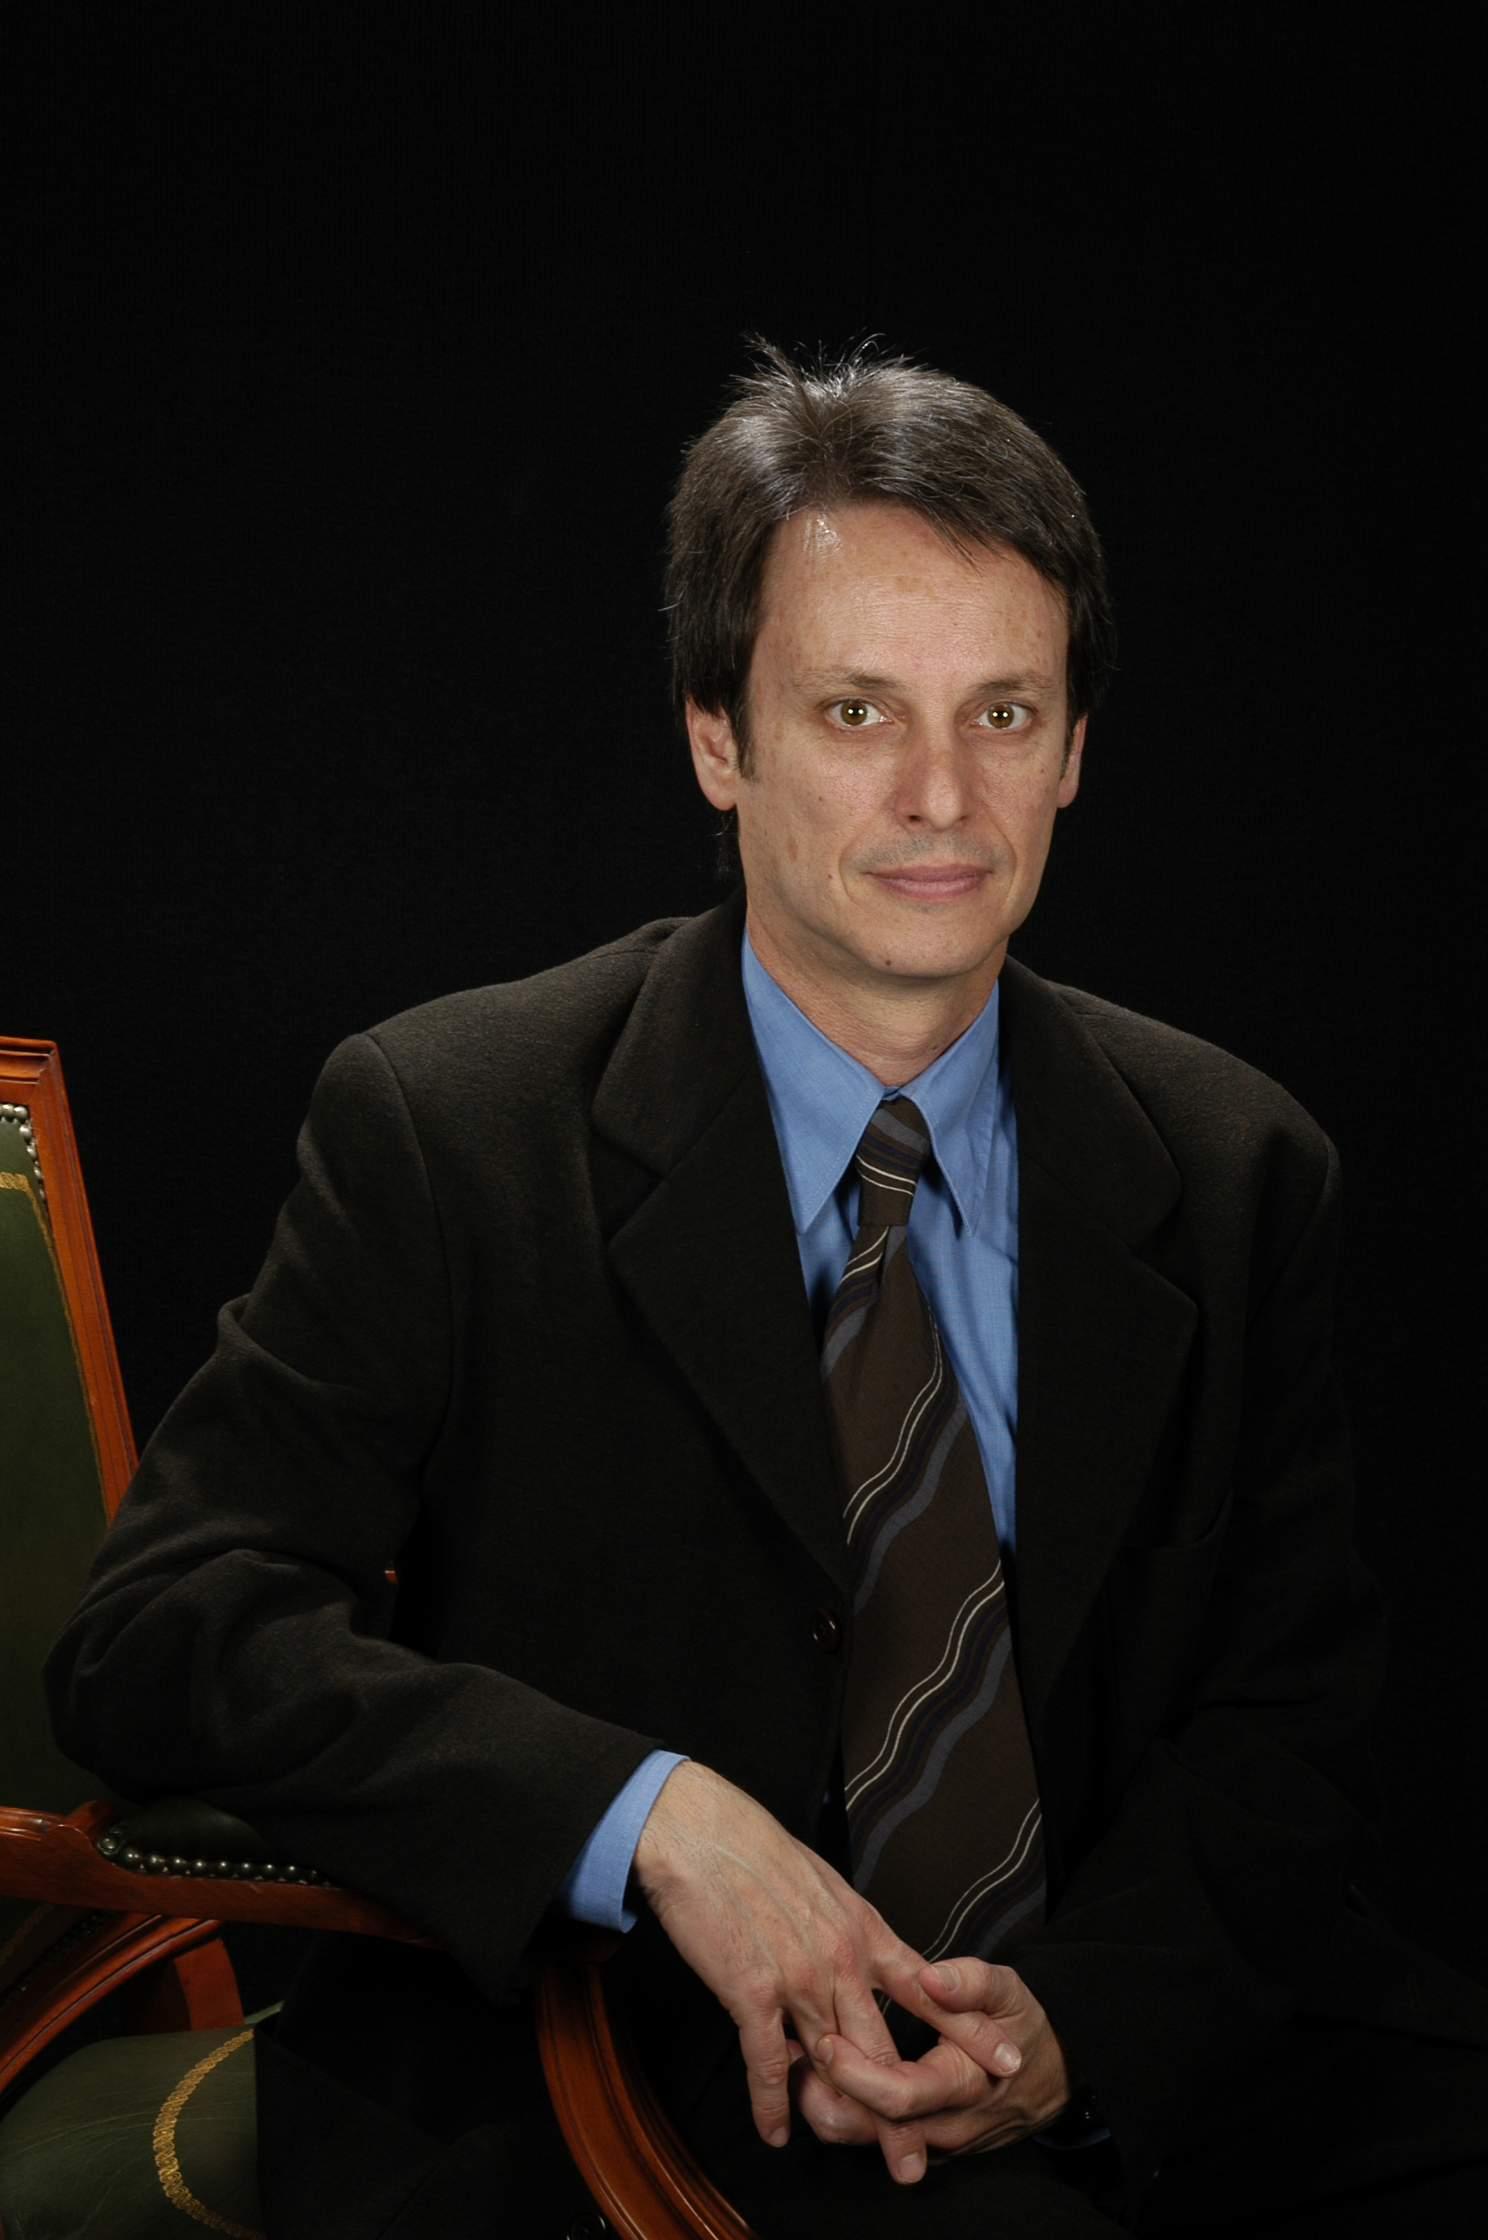 Dr. Àngel Asensi Blanch